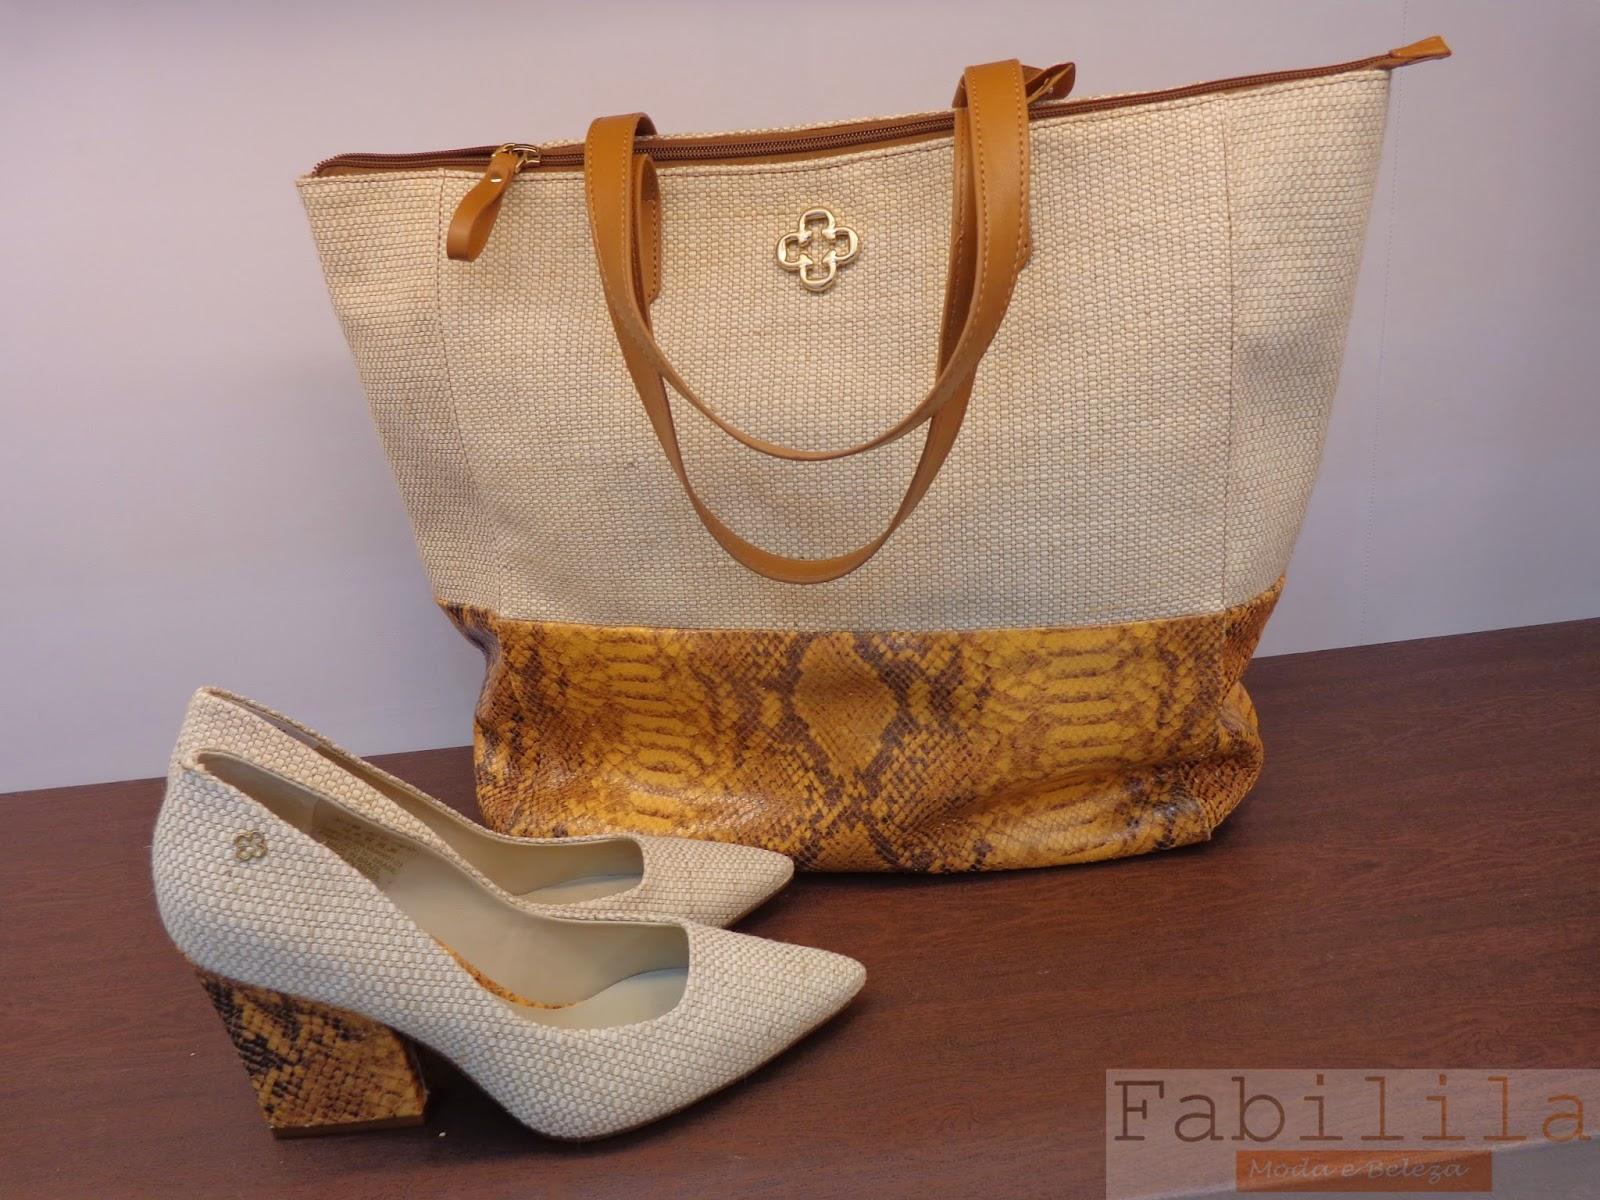 Bolsa e Sapatos - Natural + Animal Print